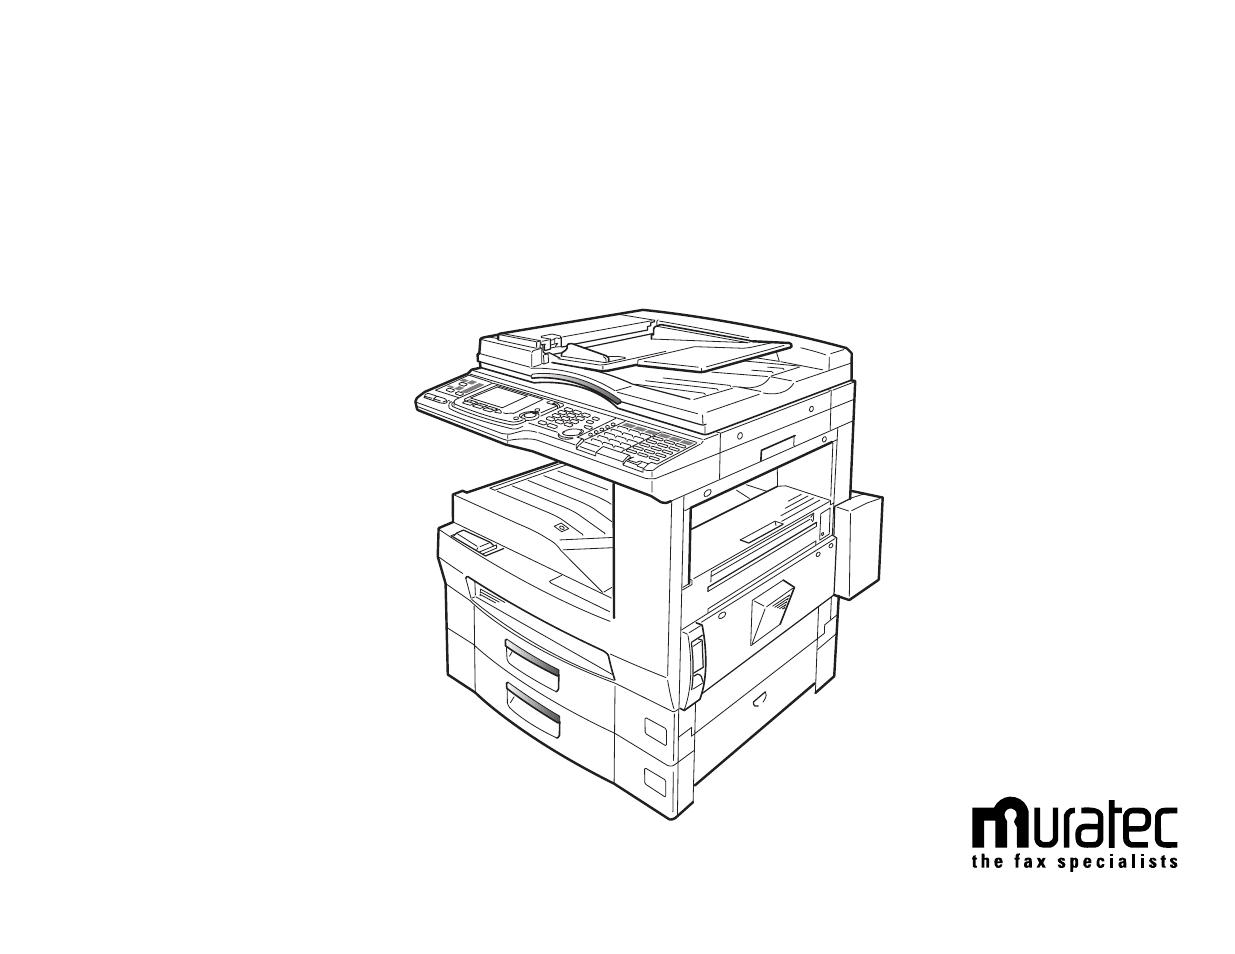 MURATEC MFX-2500 DRIVER